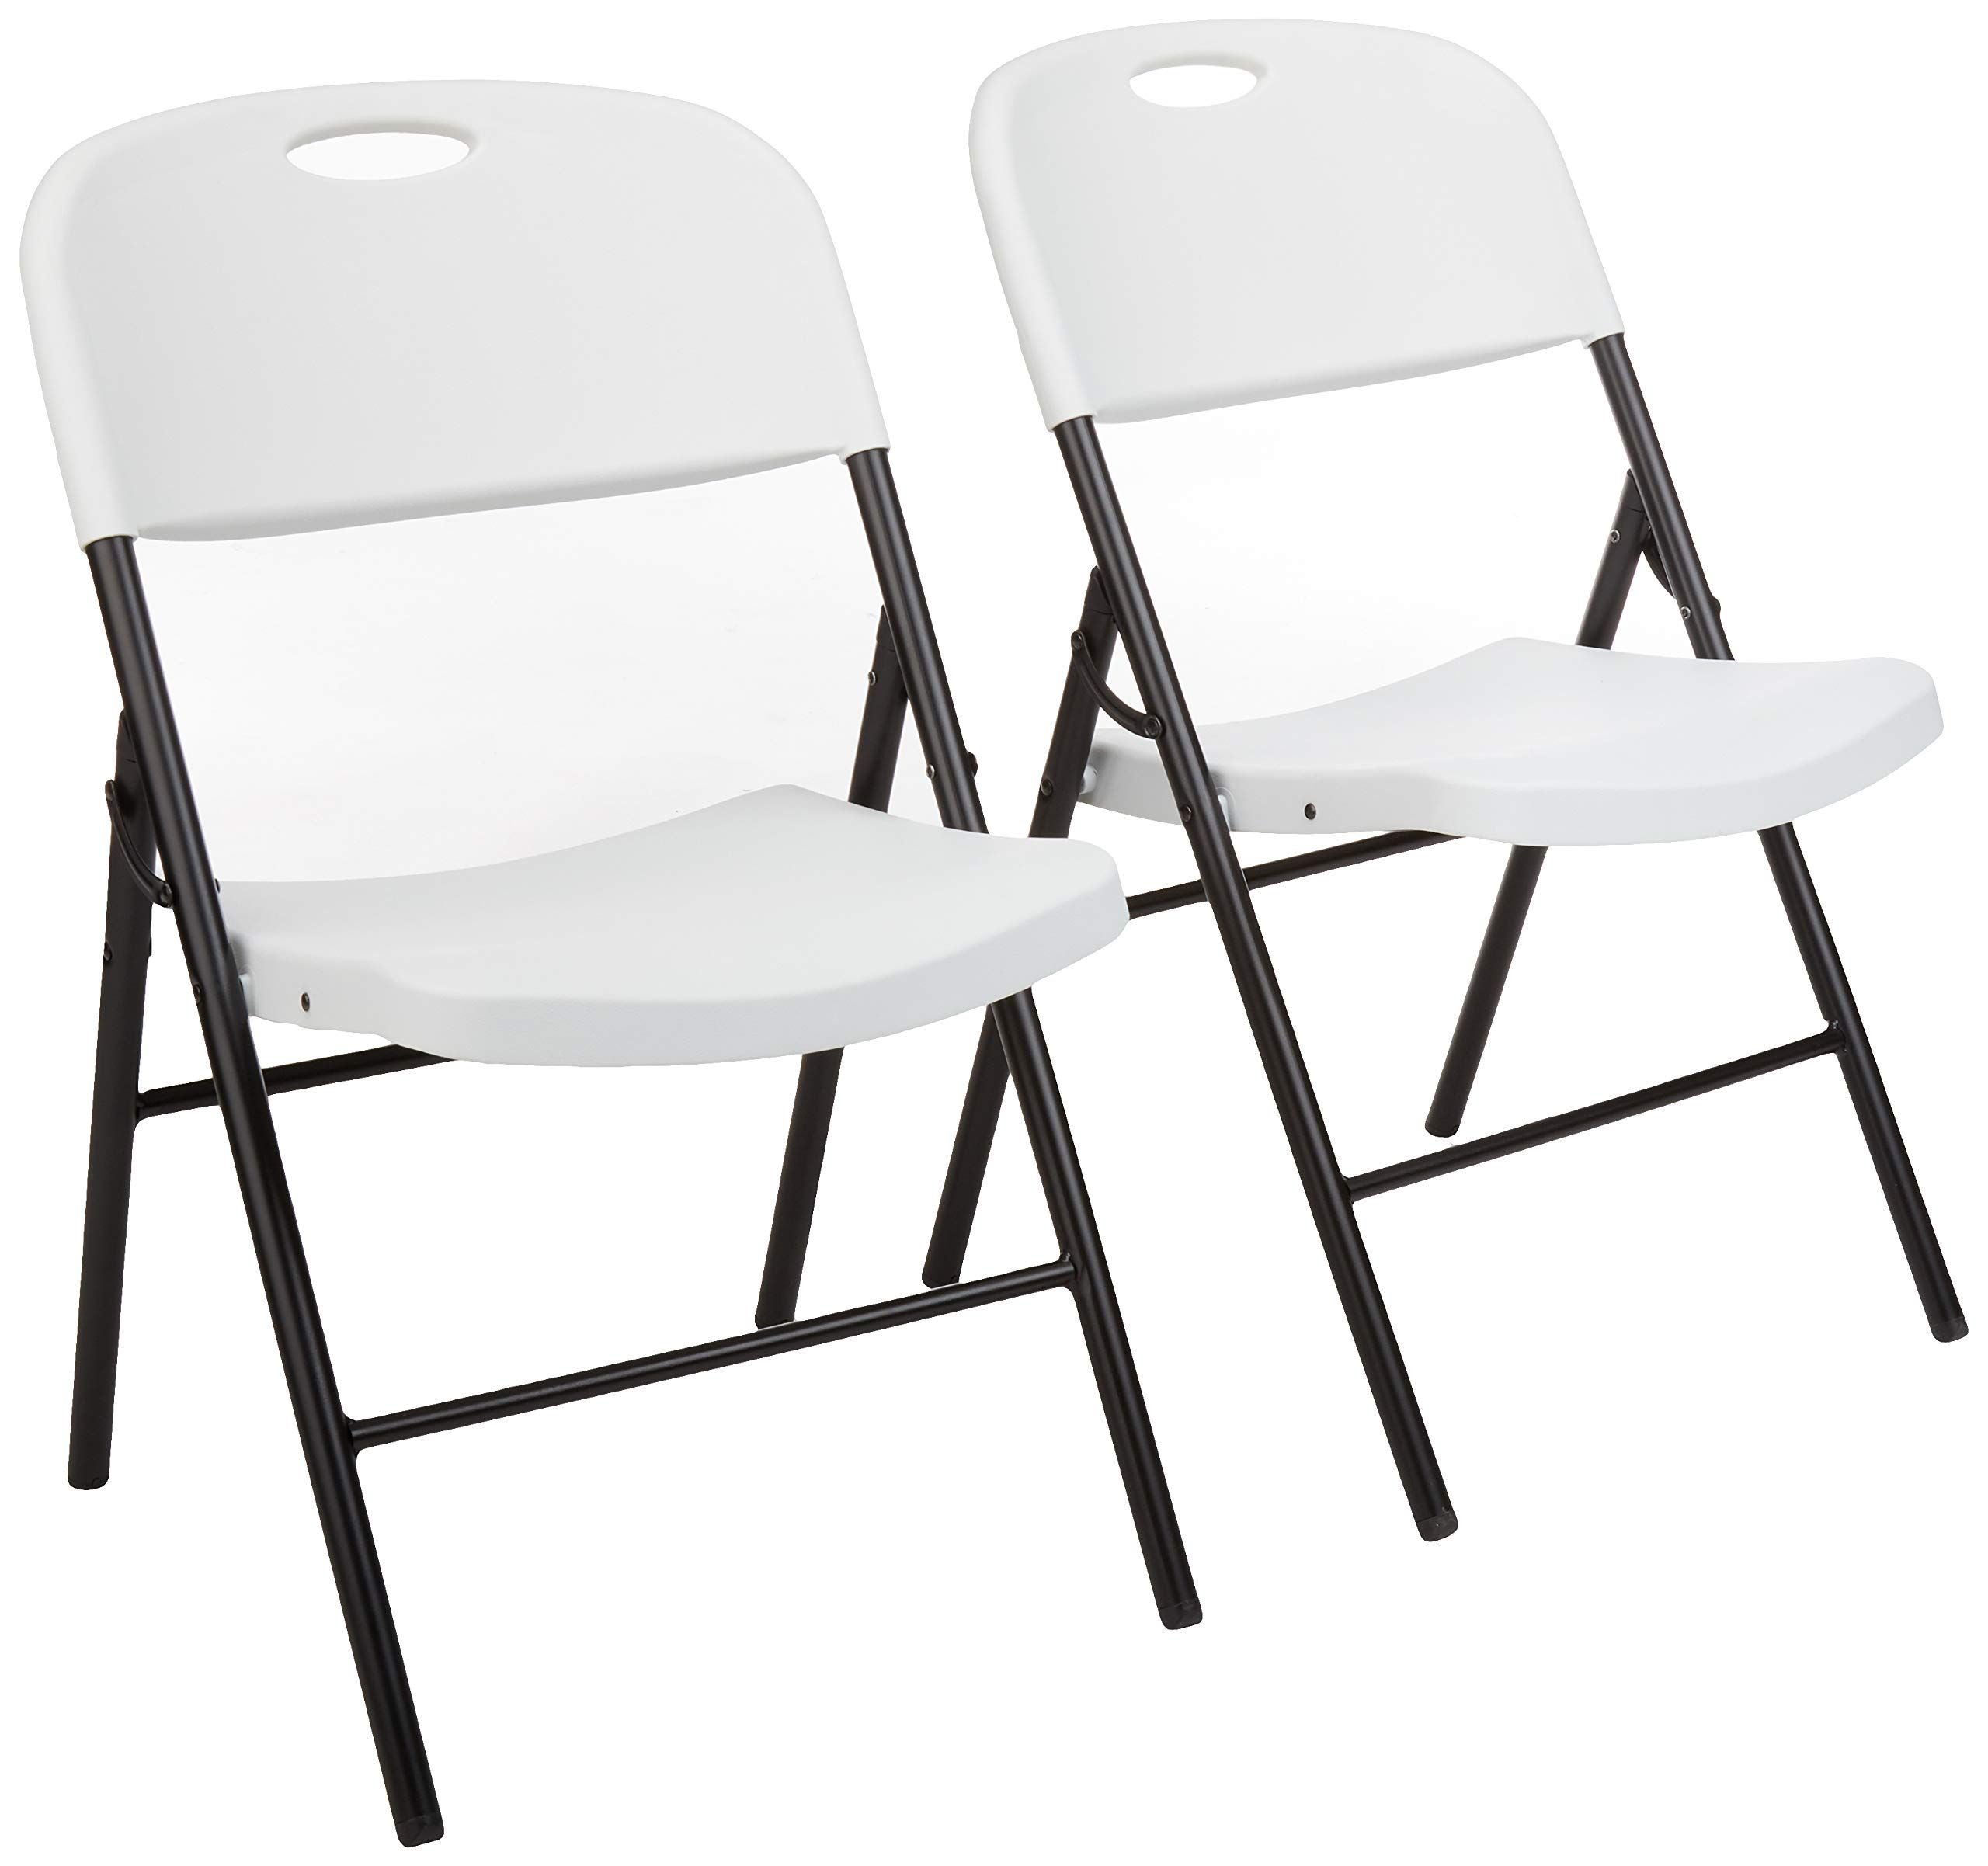 Amazonbasics Folding Plastic Chair 350 Pound Capacity White Set